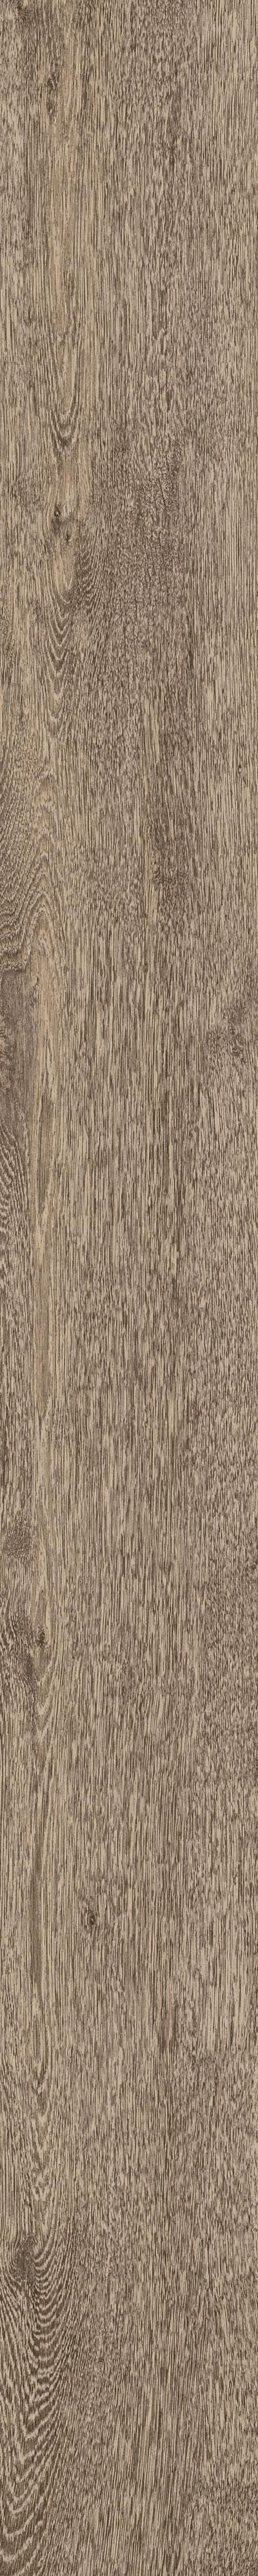 Porcelain-Tile-Castagno-maximum-Natura-maximum-wallpaper-wpc9208071